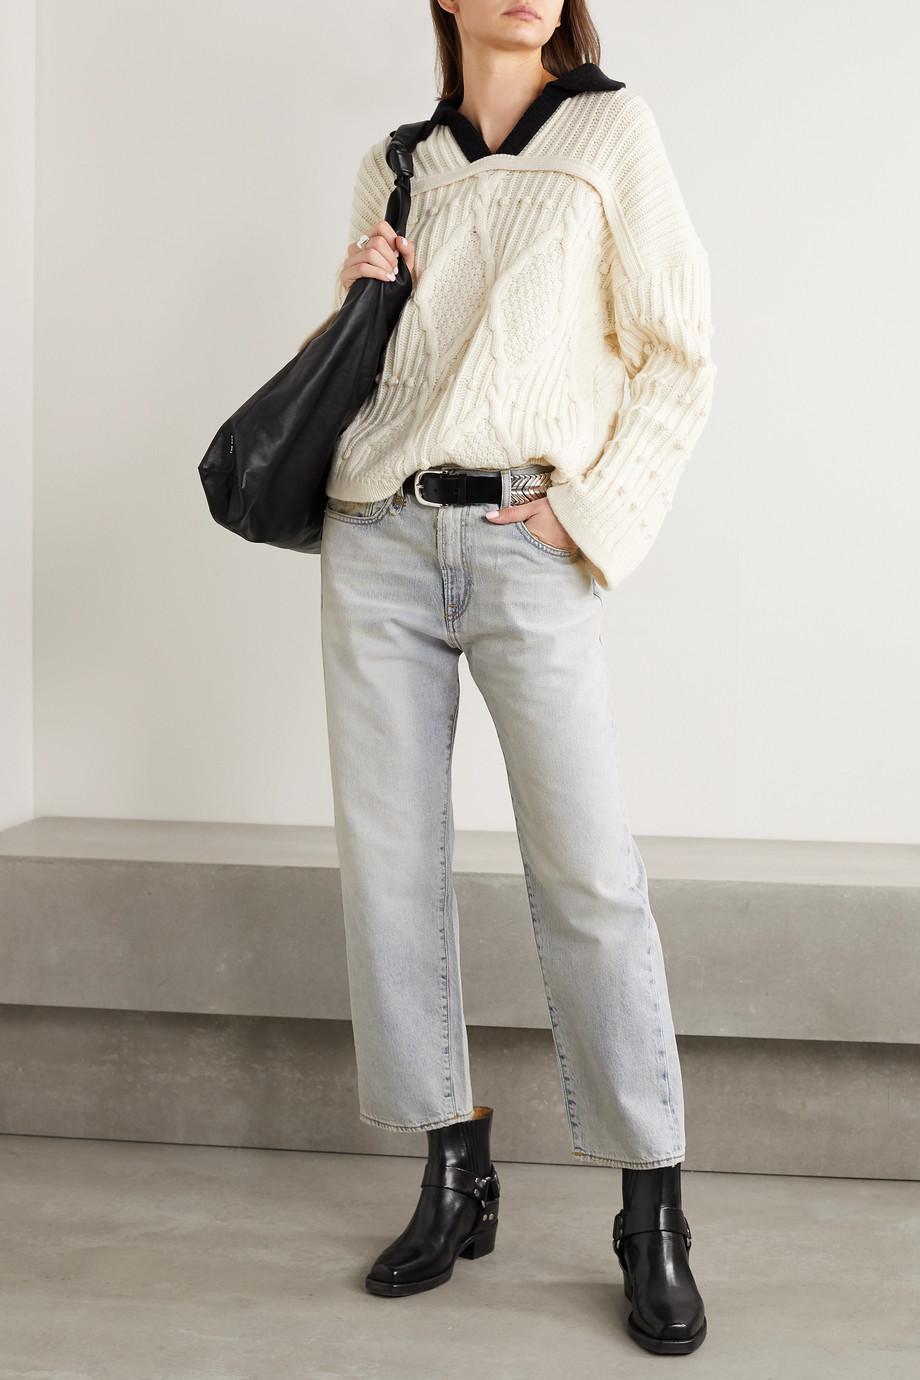 R13 Mid-rise boyfriend jeans